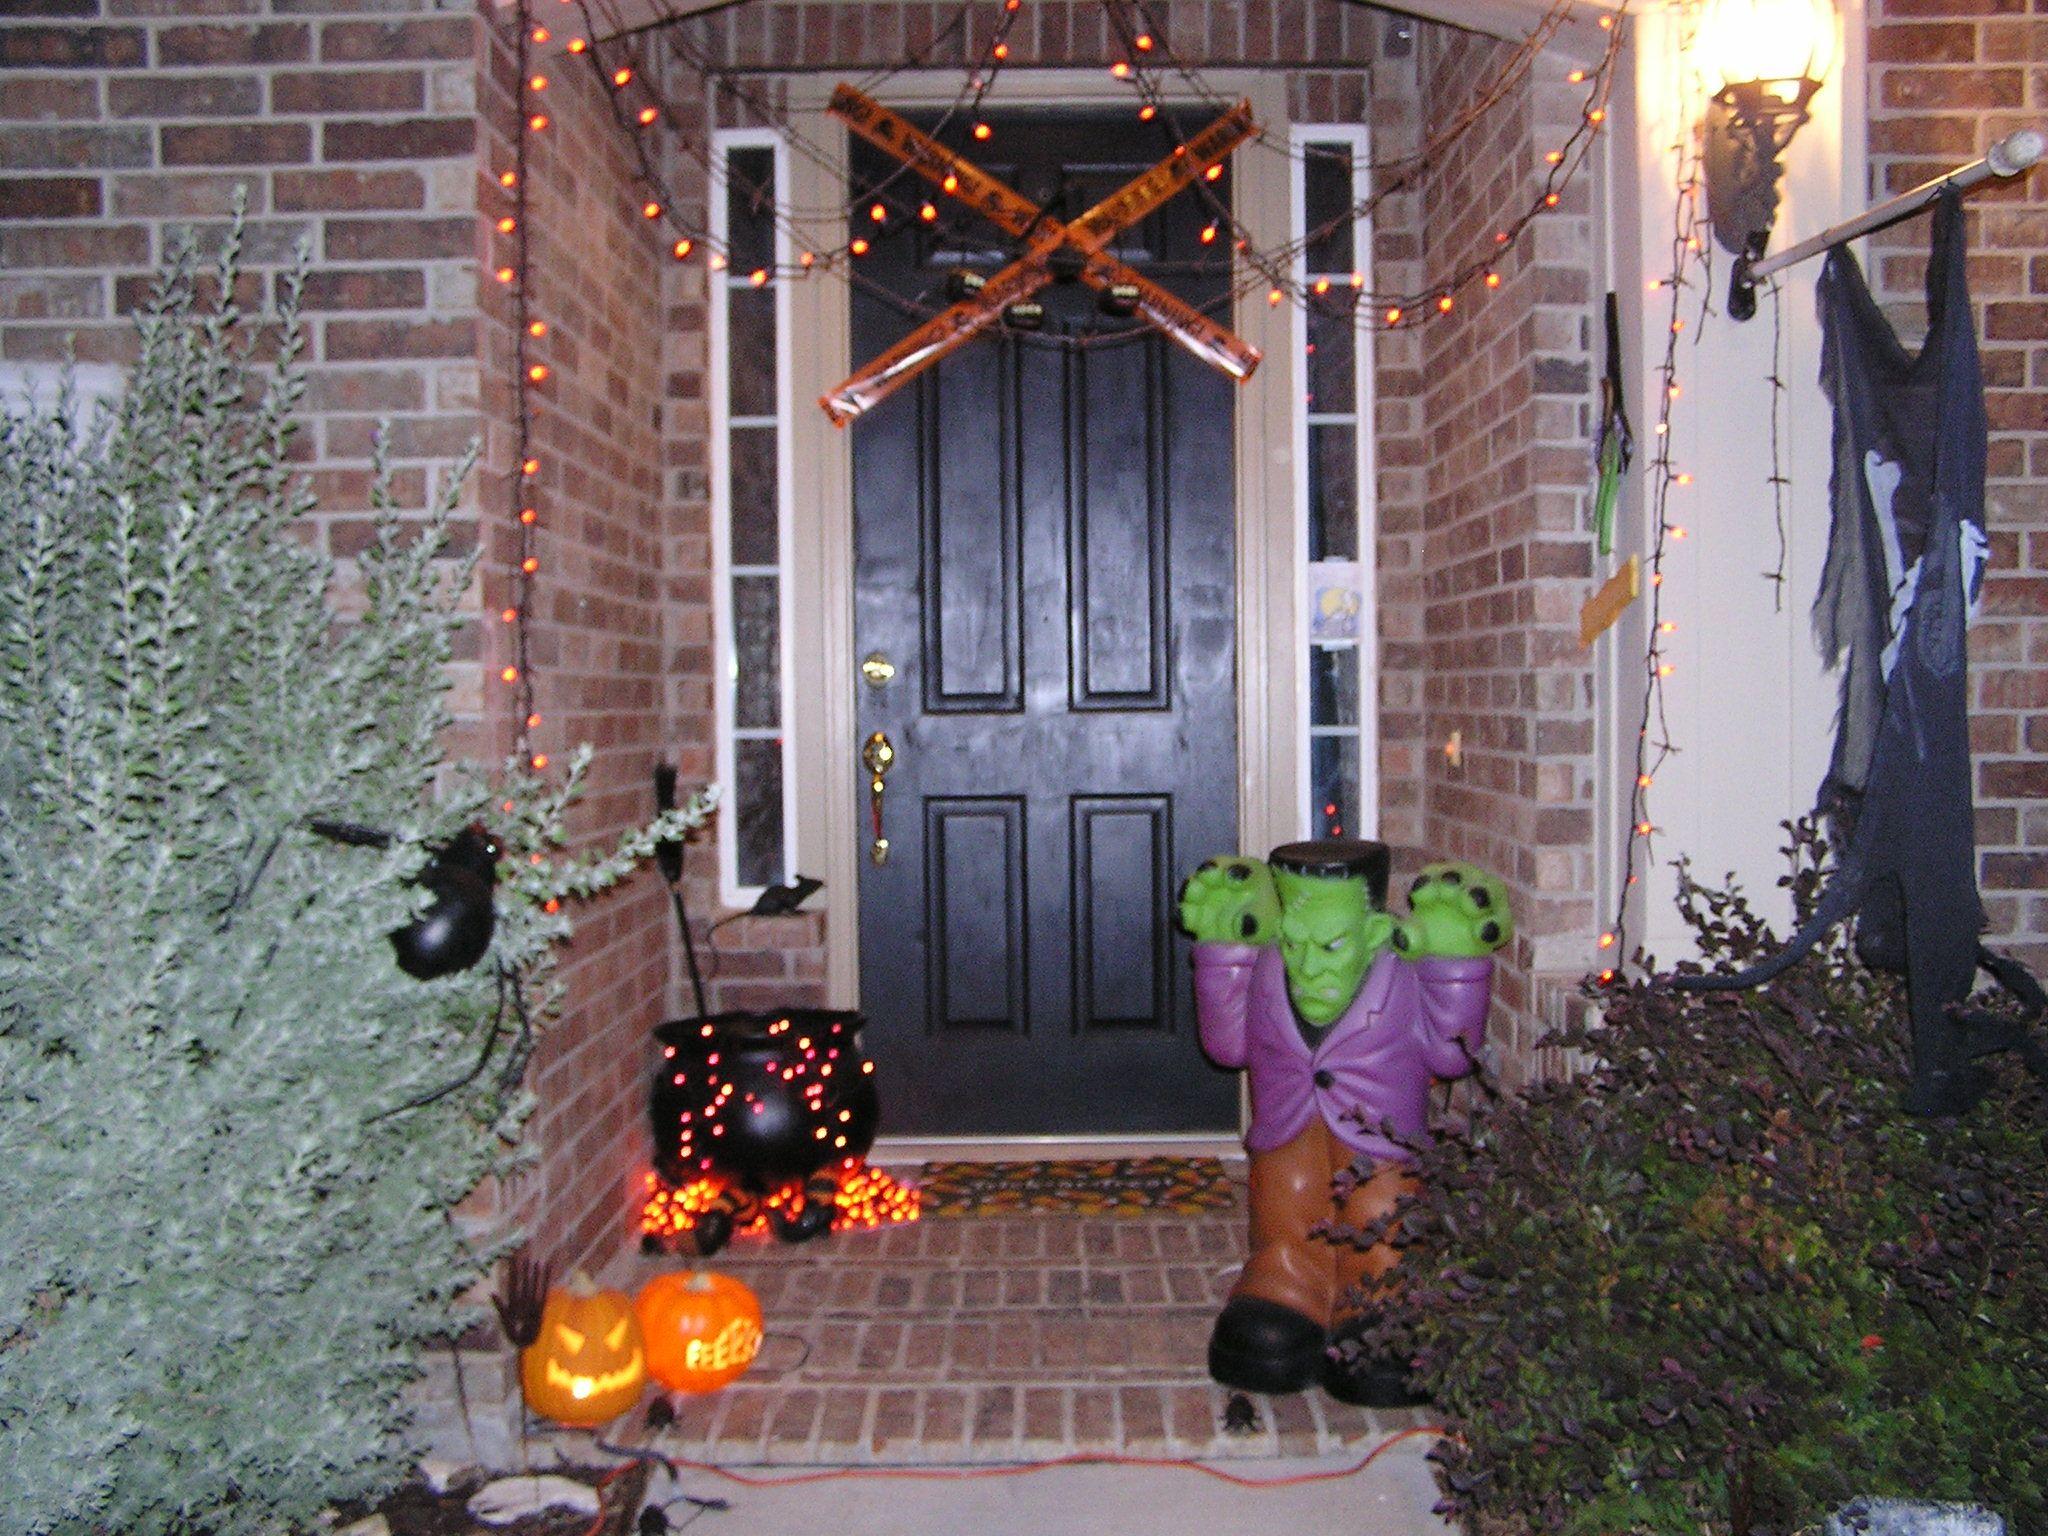 Halloween front porch decorations halloween pinterest for Pinterest halloween outdoor decorations